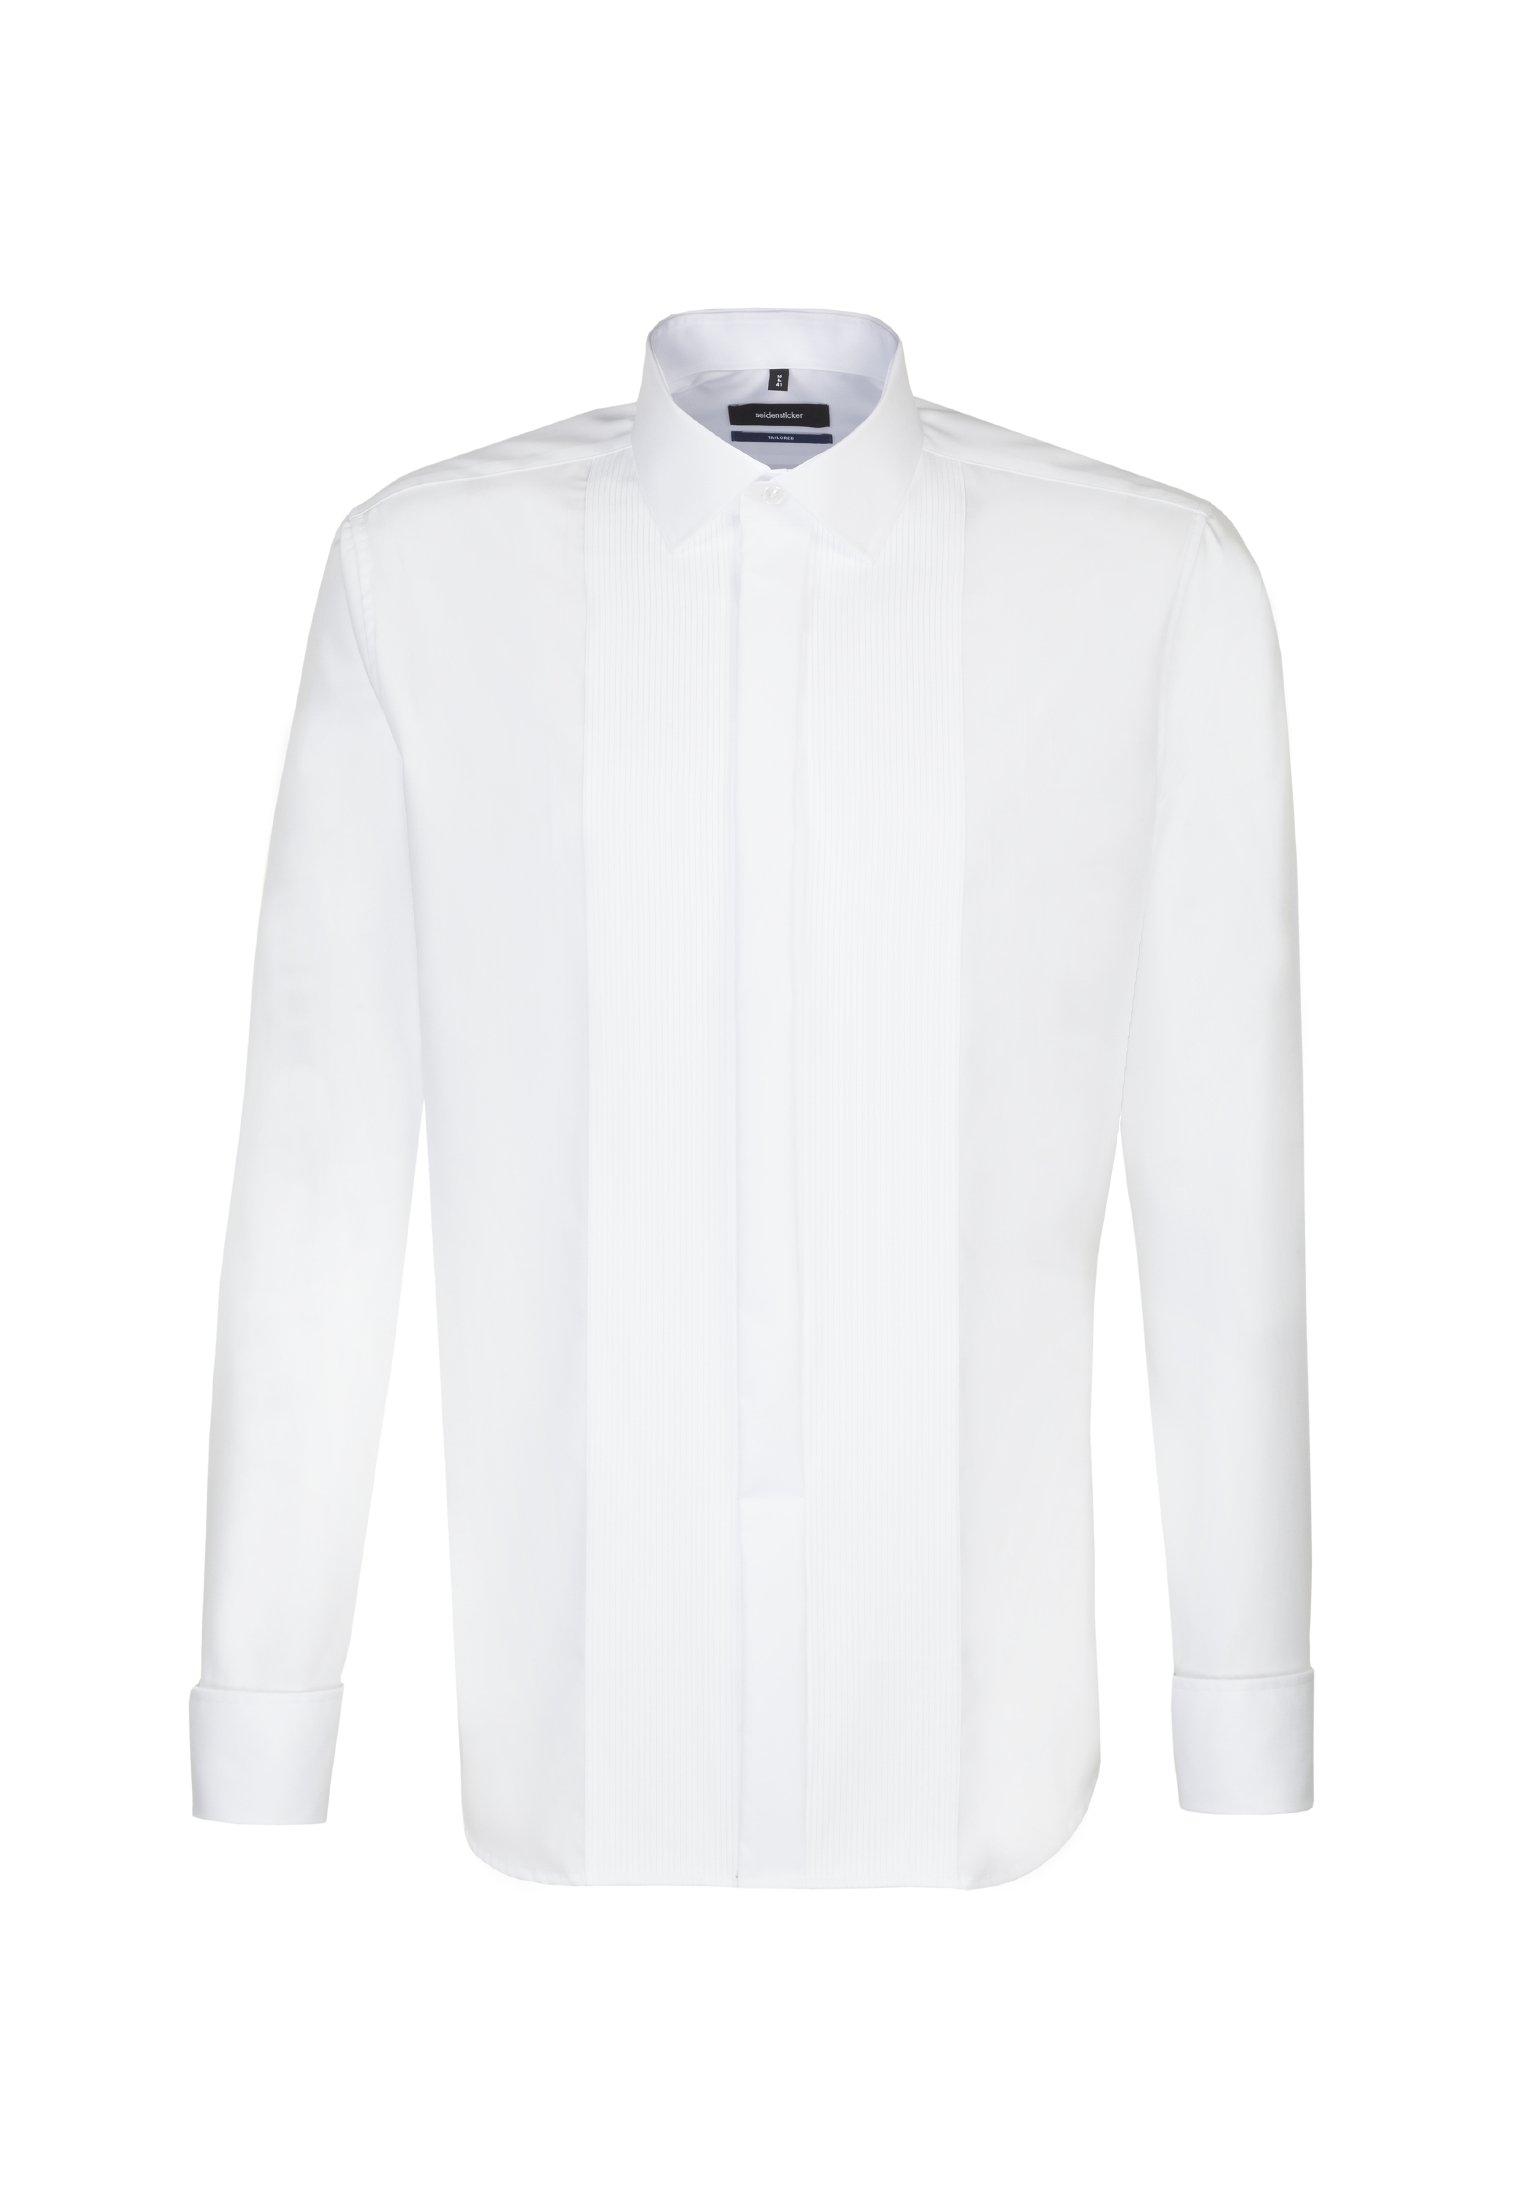 seidensticker smokingoverhemd Shaped Shaped lange mouwen kentkraag uni goedkoop op otto.nl kopen